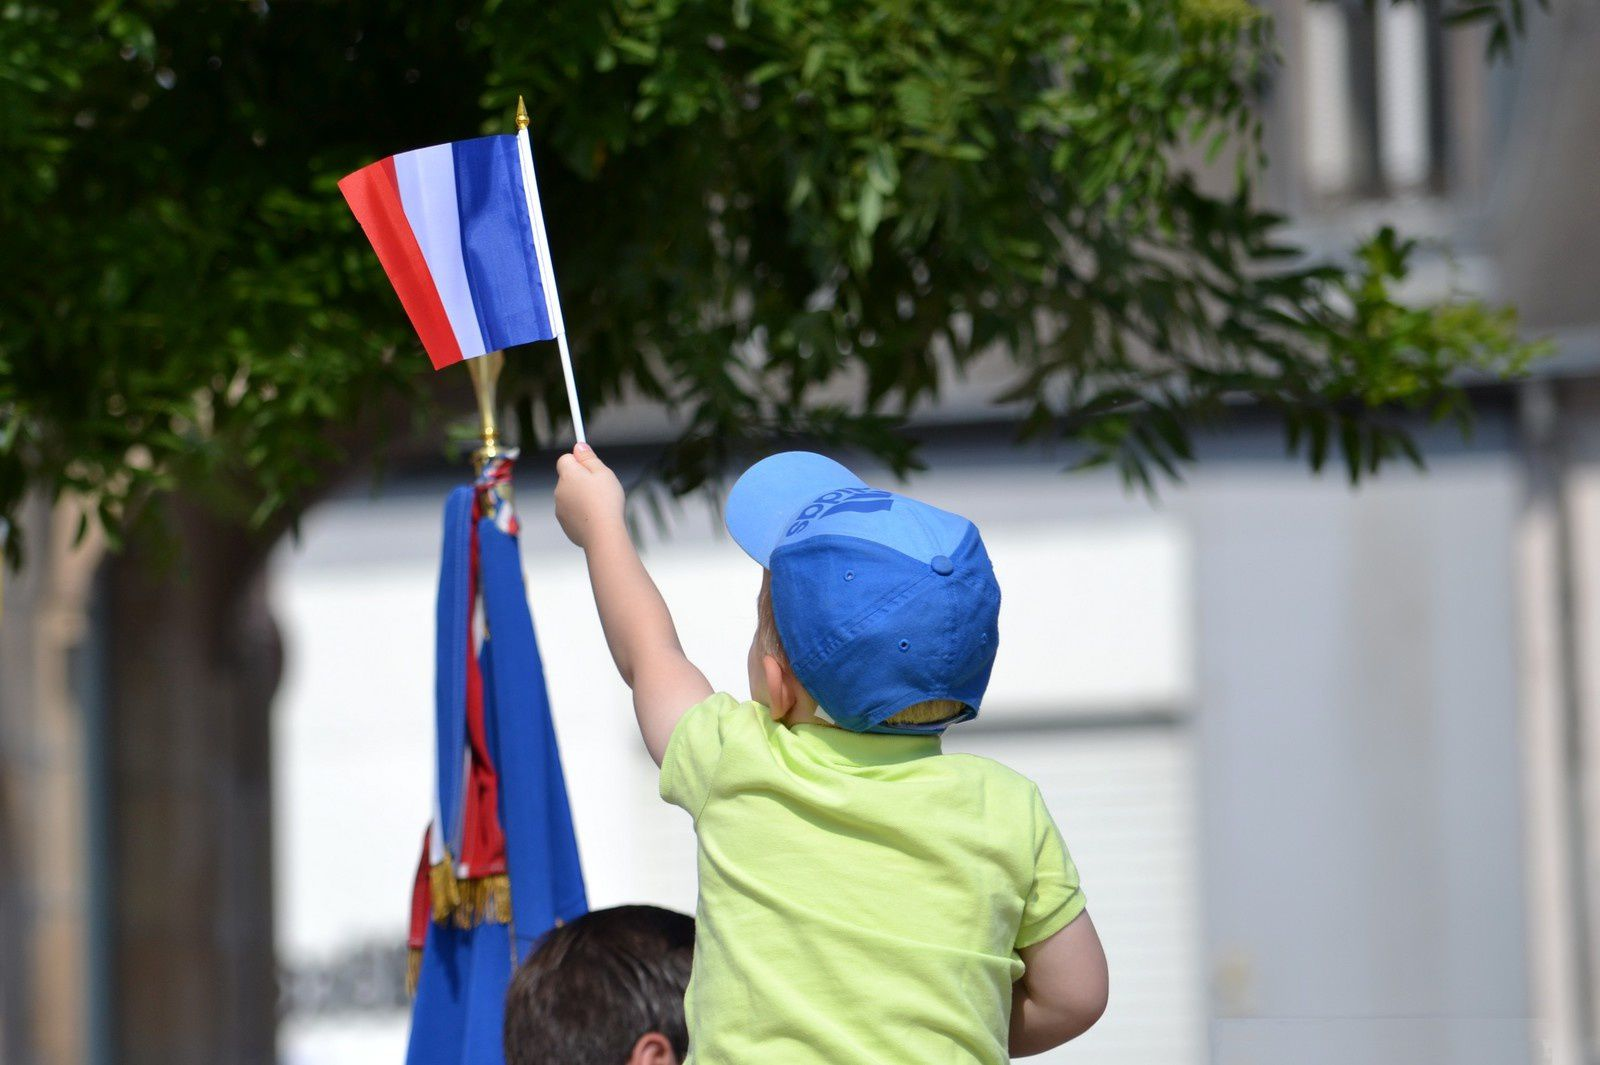 Fête nationale à Belfort